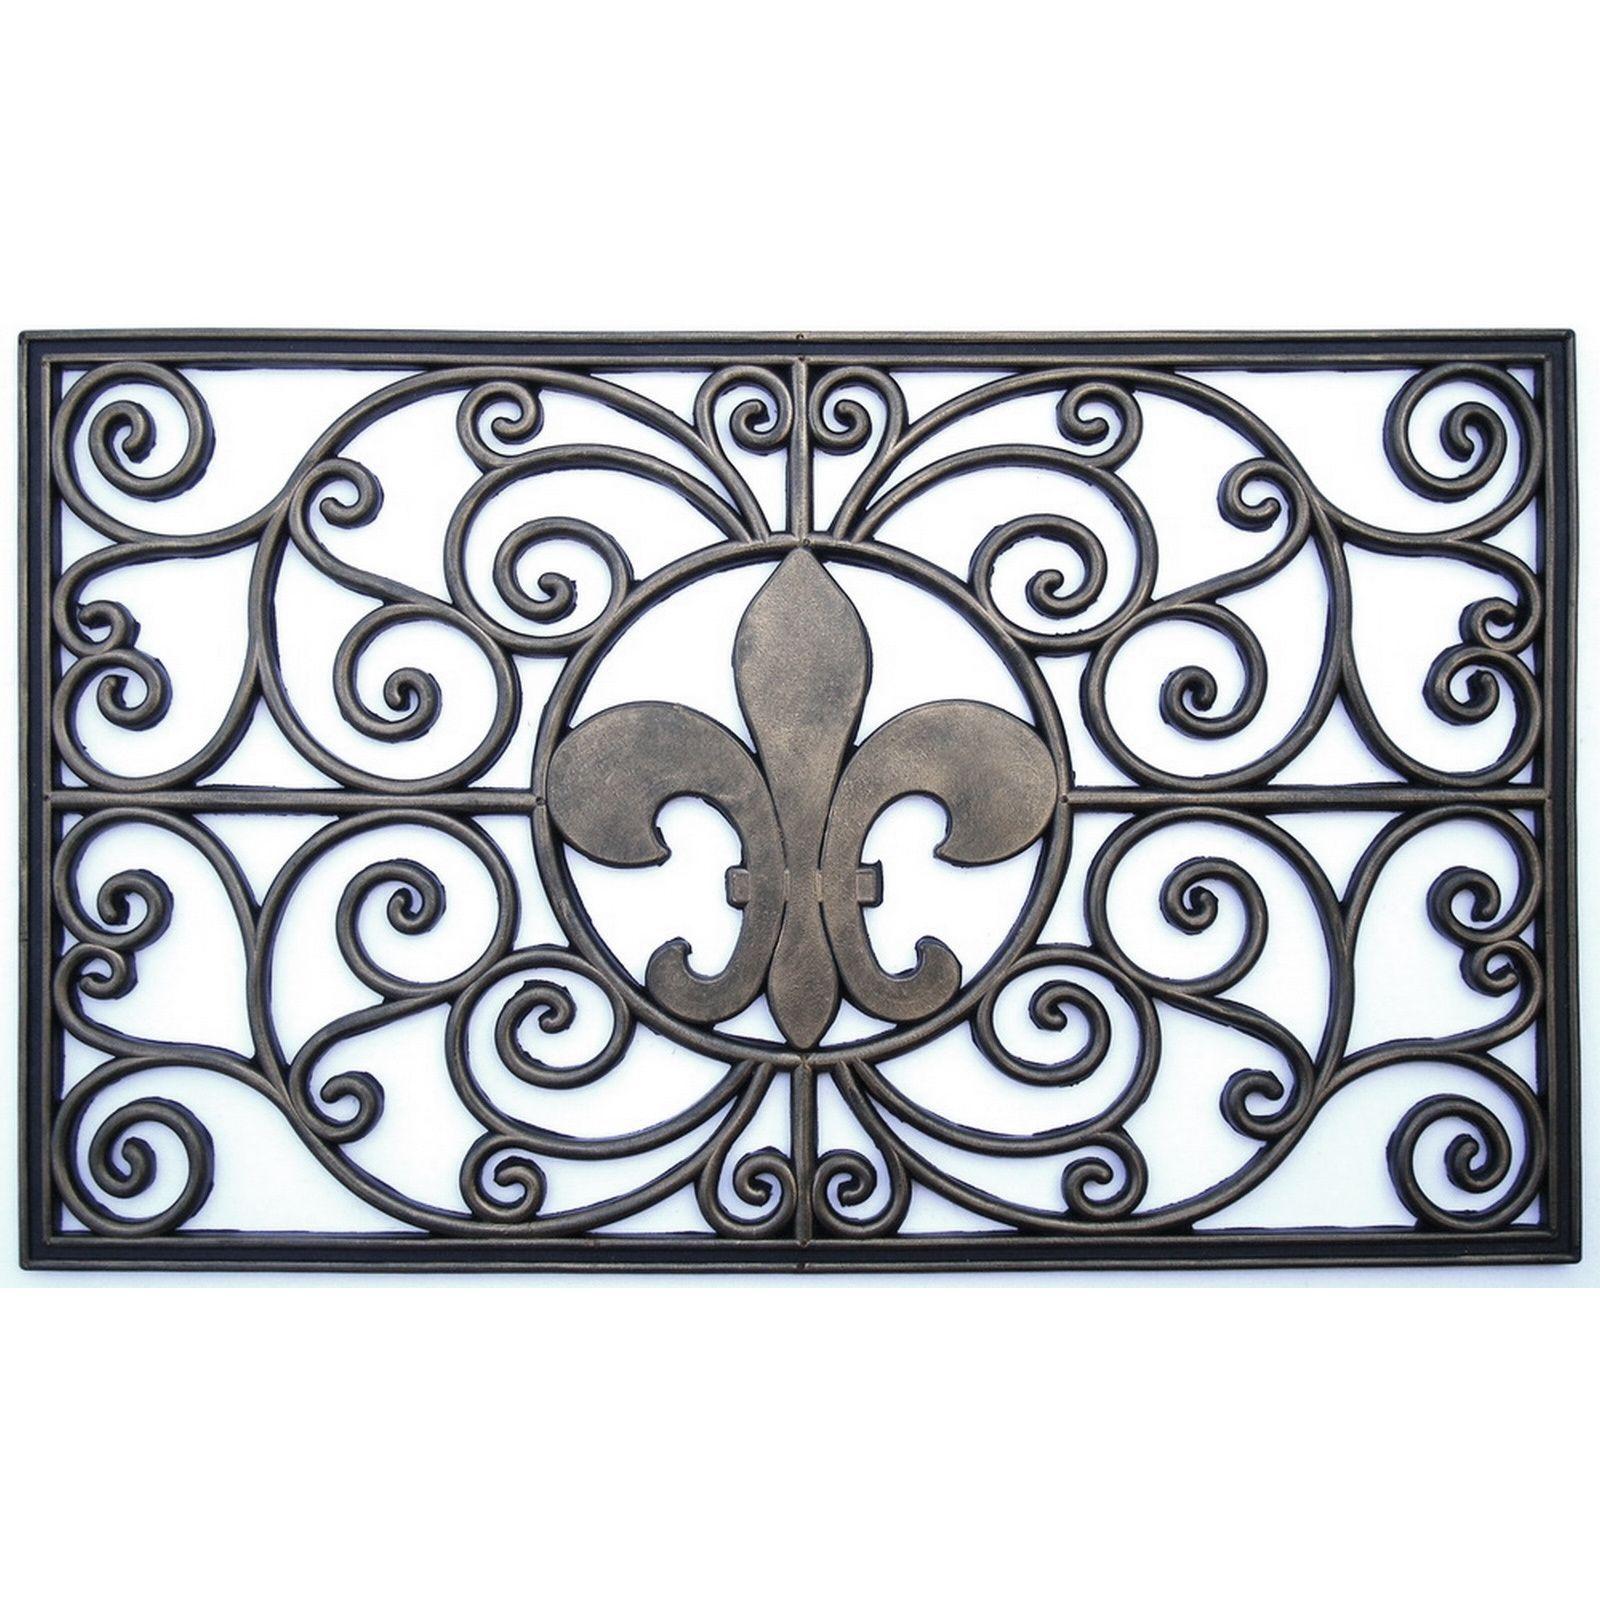 Our Best Decorative Accessories Deals Door Mat Decorative Vent Cover Fleur De Lis Fleur de lis door mats